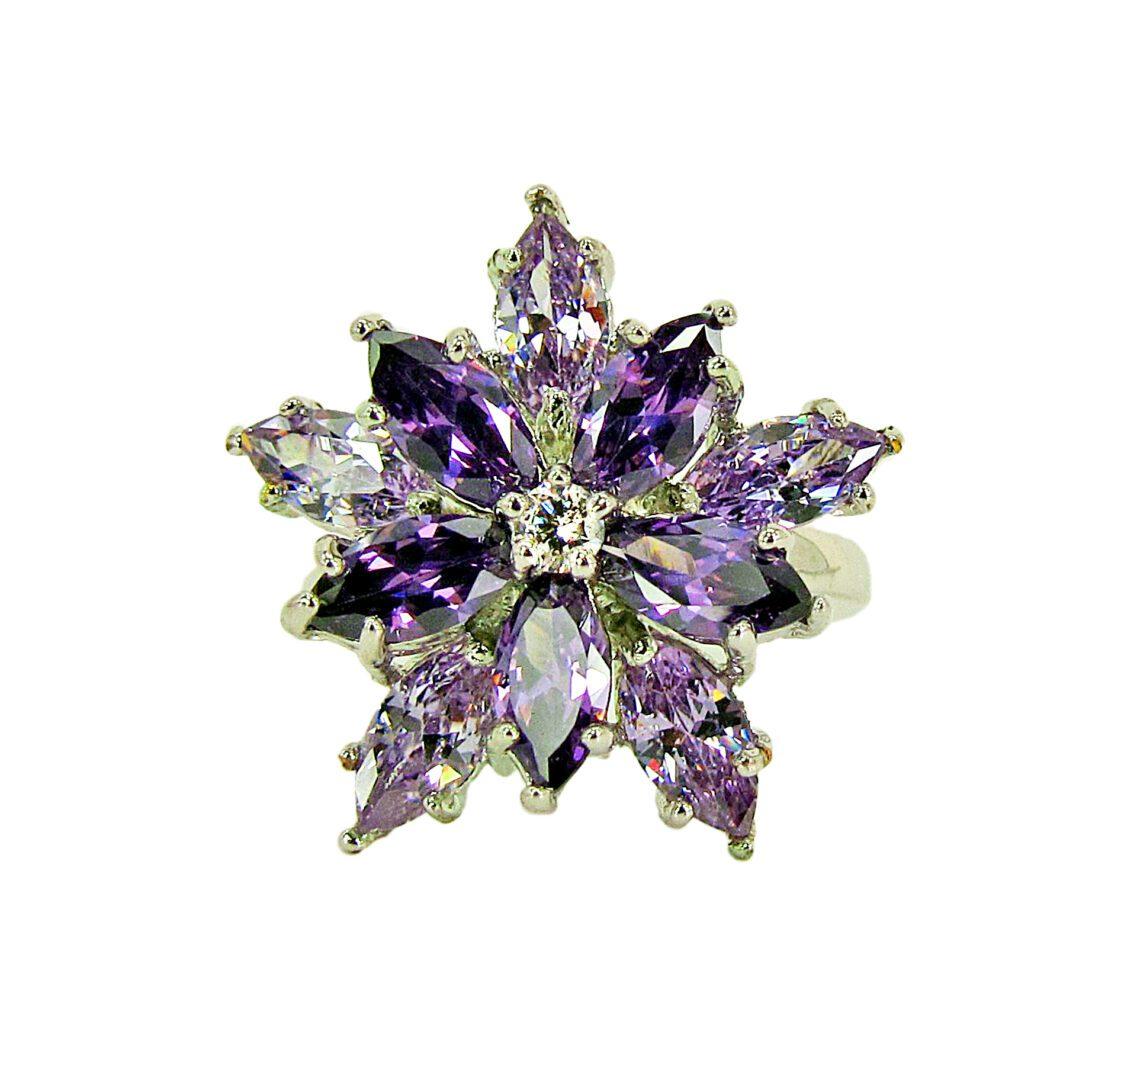 ring with violet gems arranged in a starburst